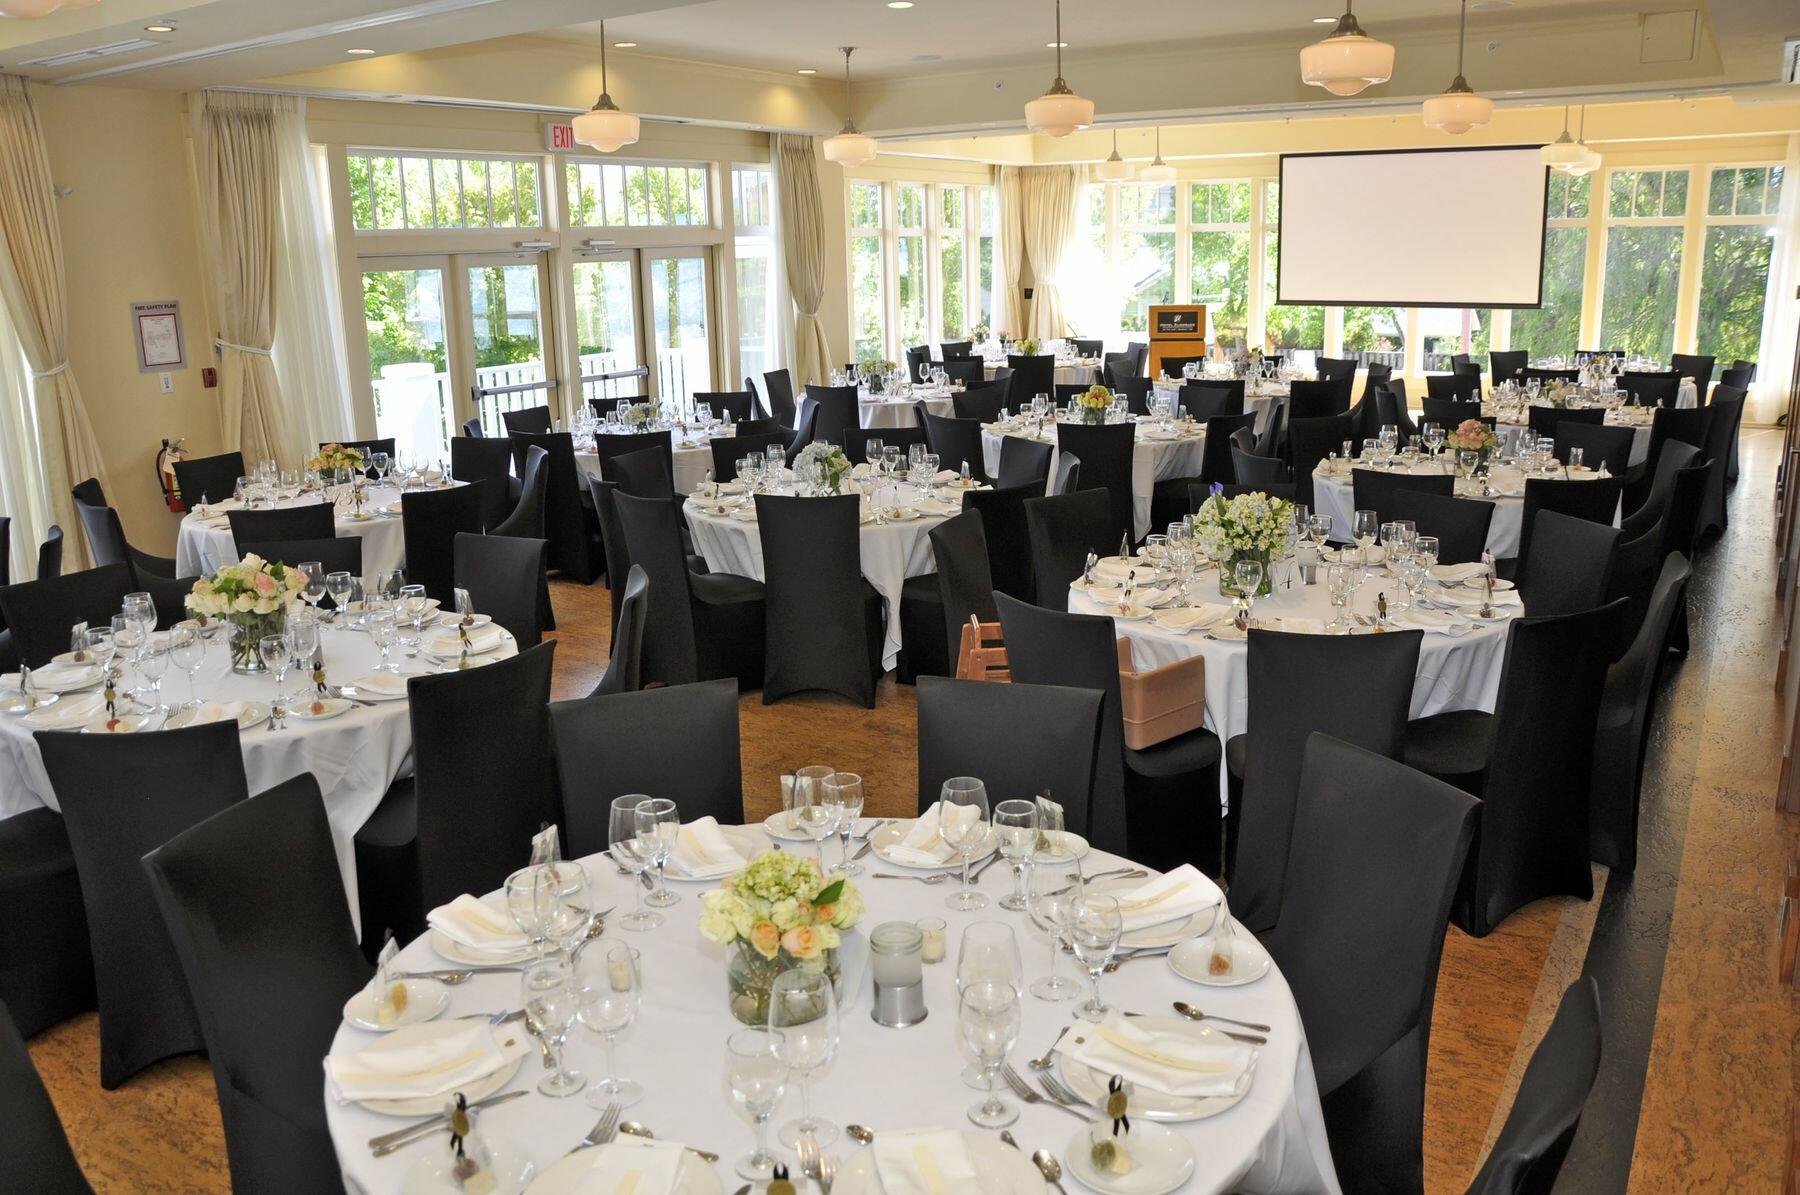 Ballroom with lake view set for wedding reception.